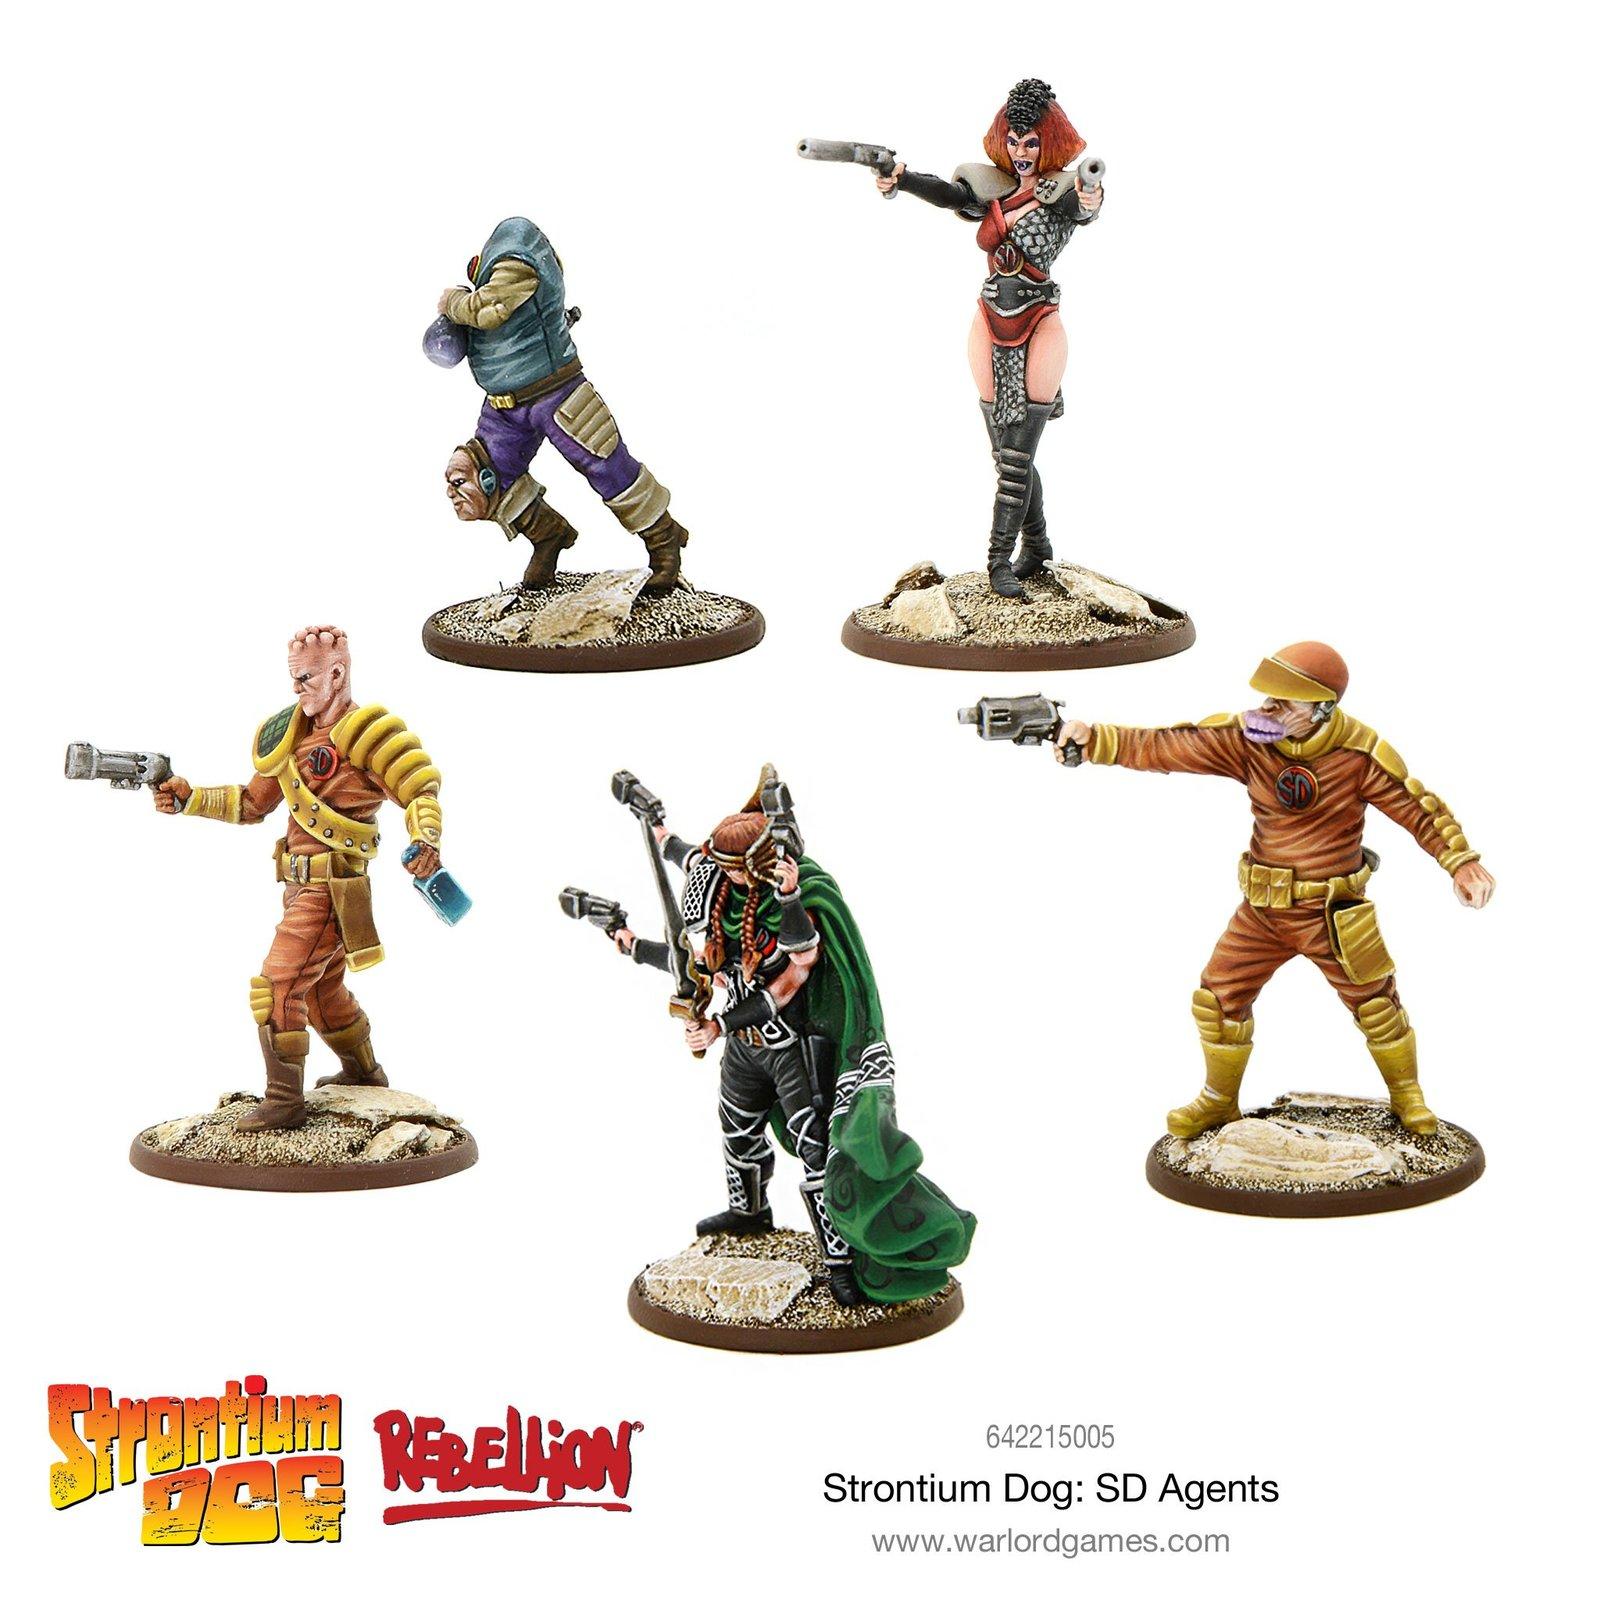 Strontium Dog: SD Agents image